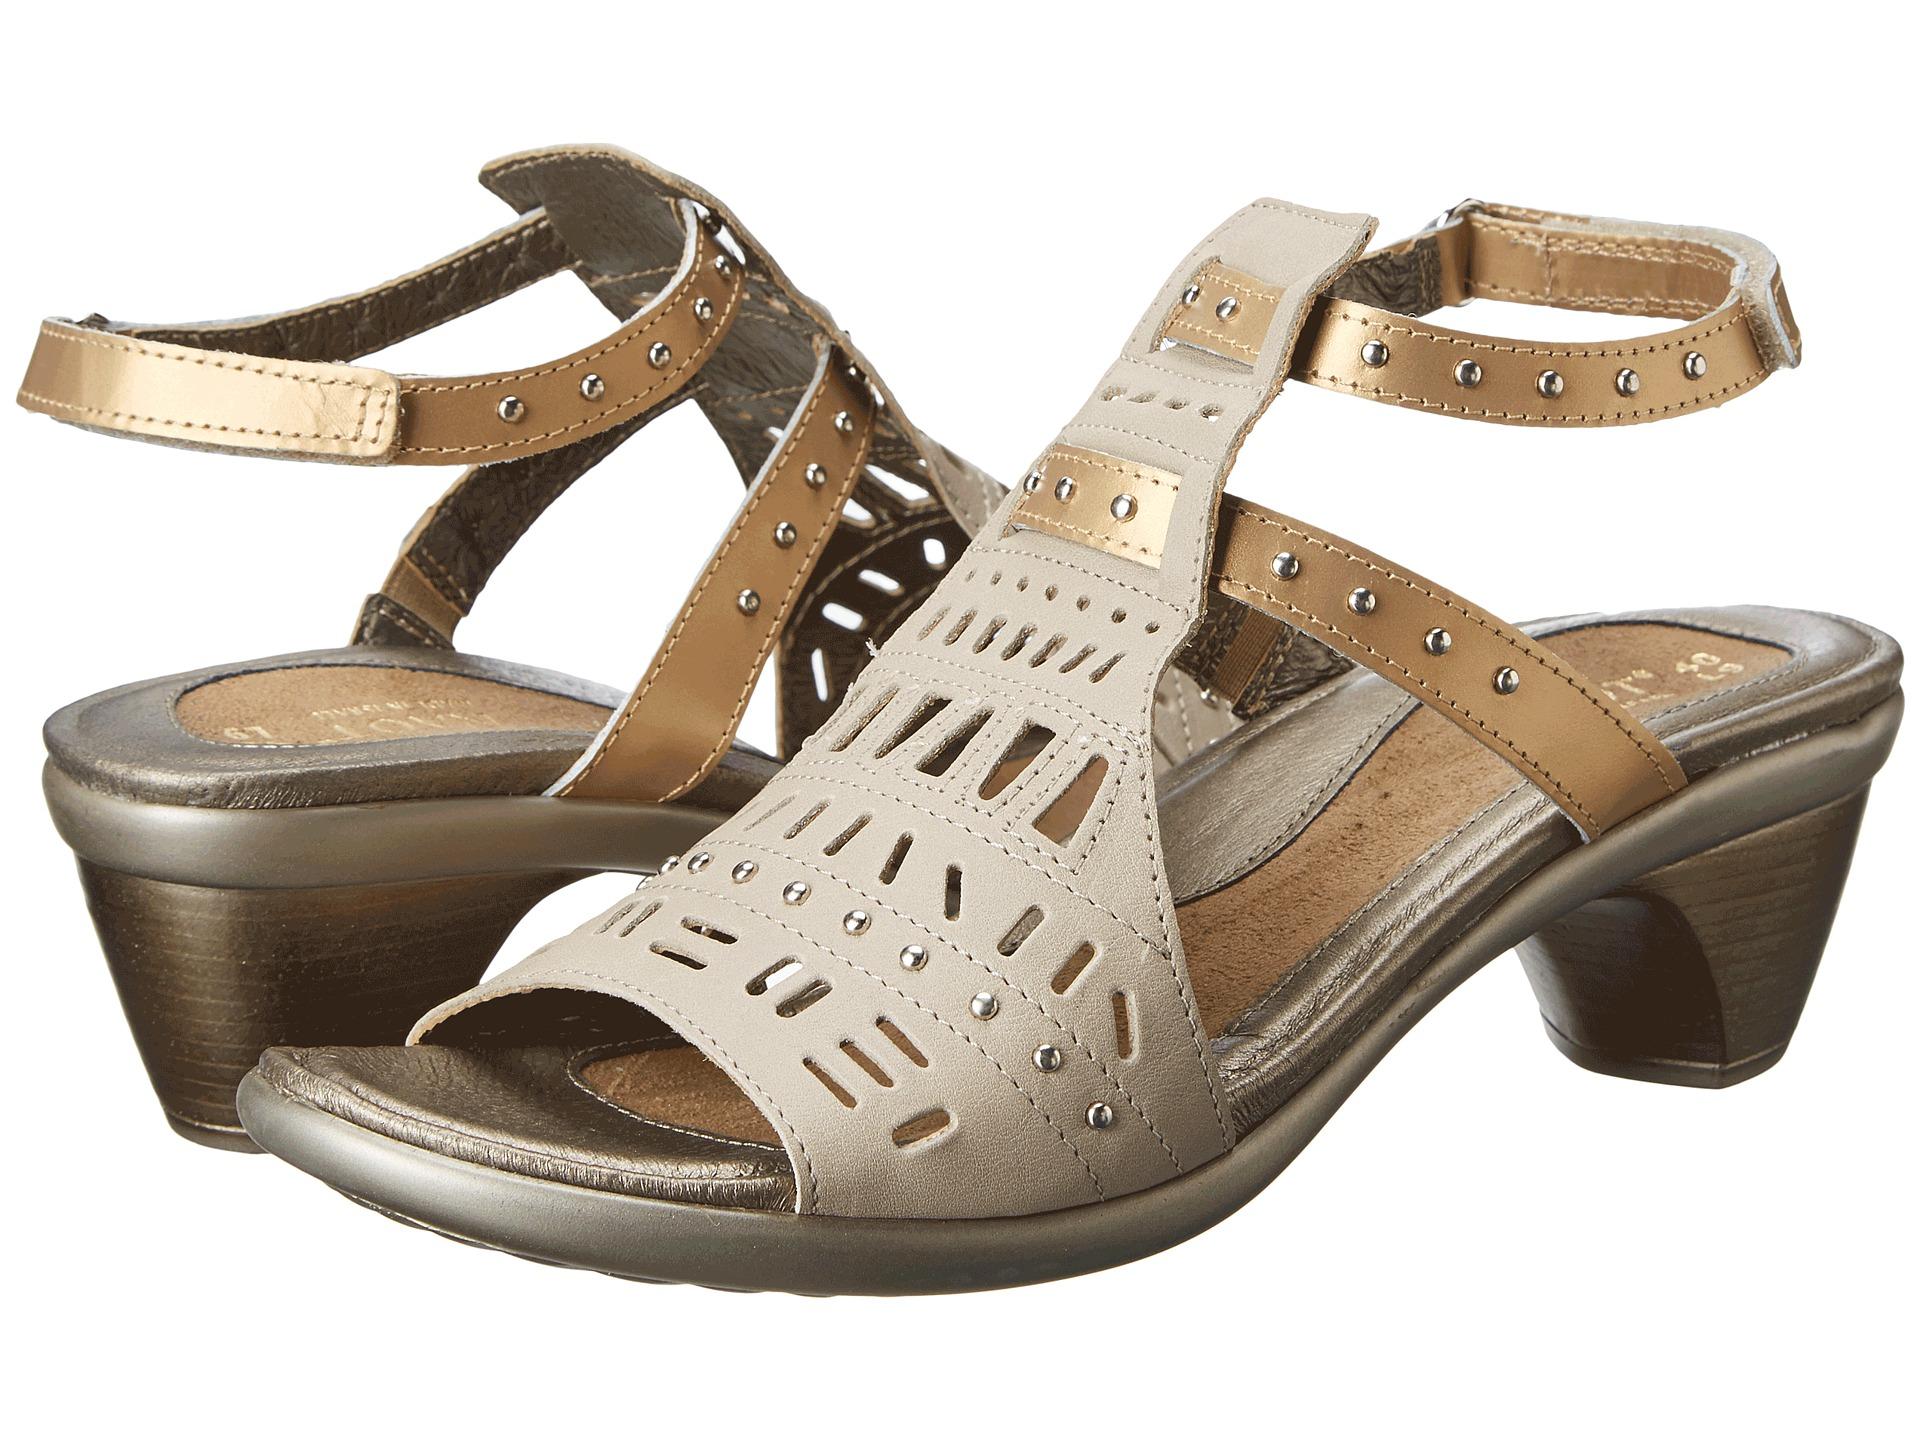 Naot Shoes Reviews